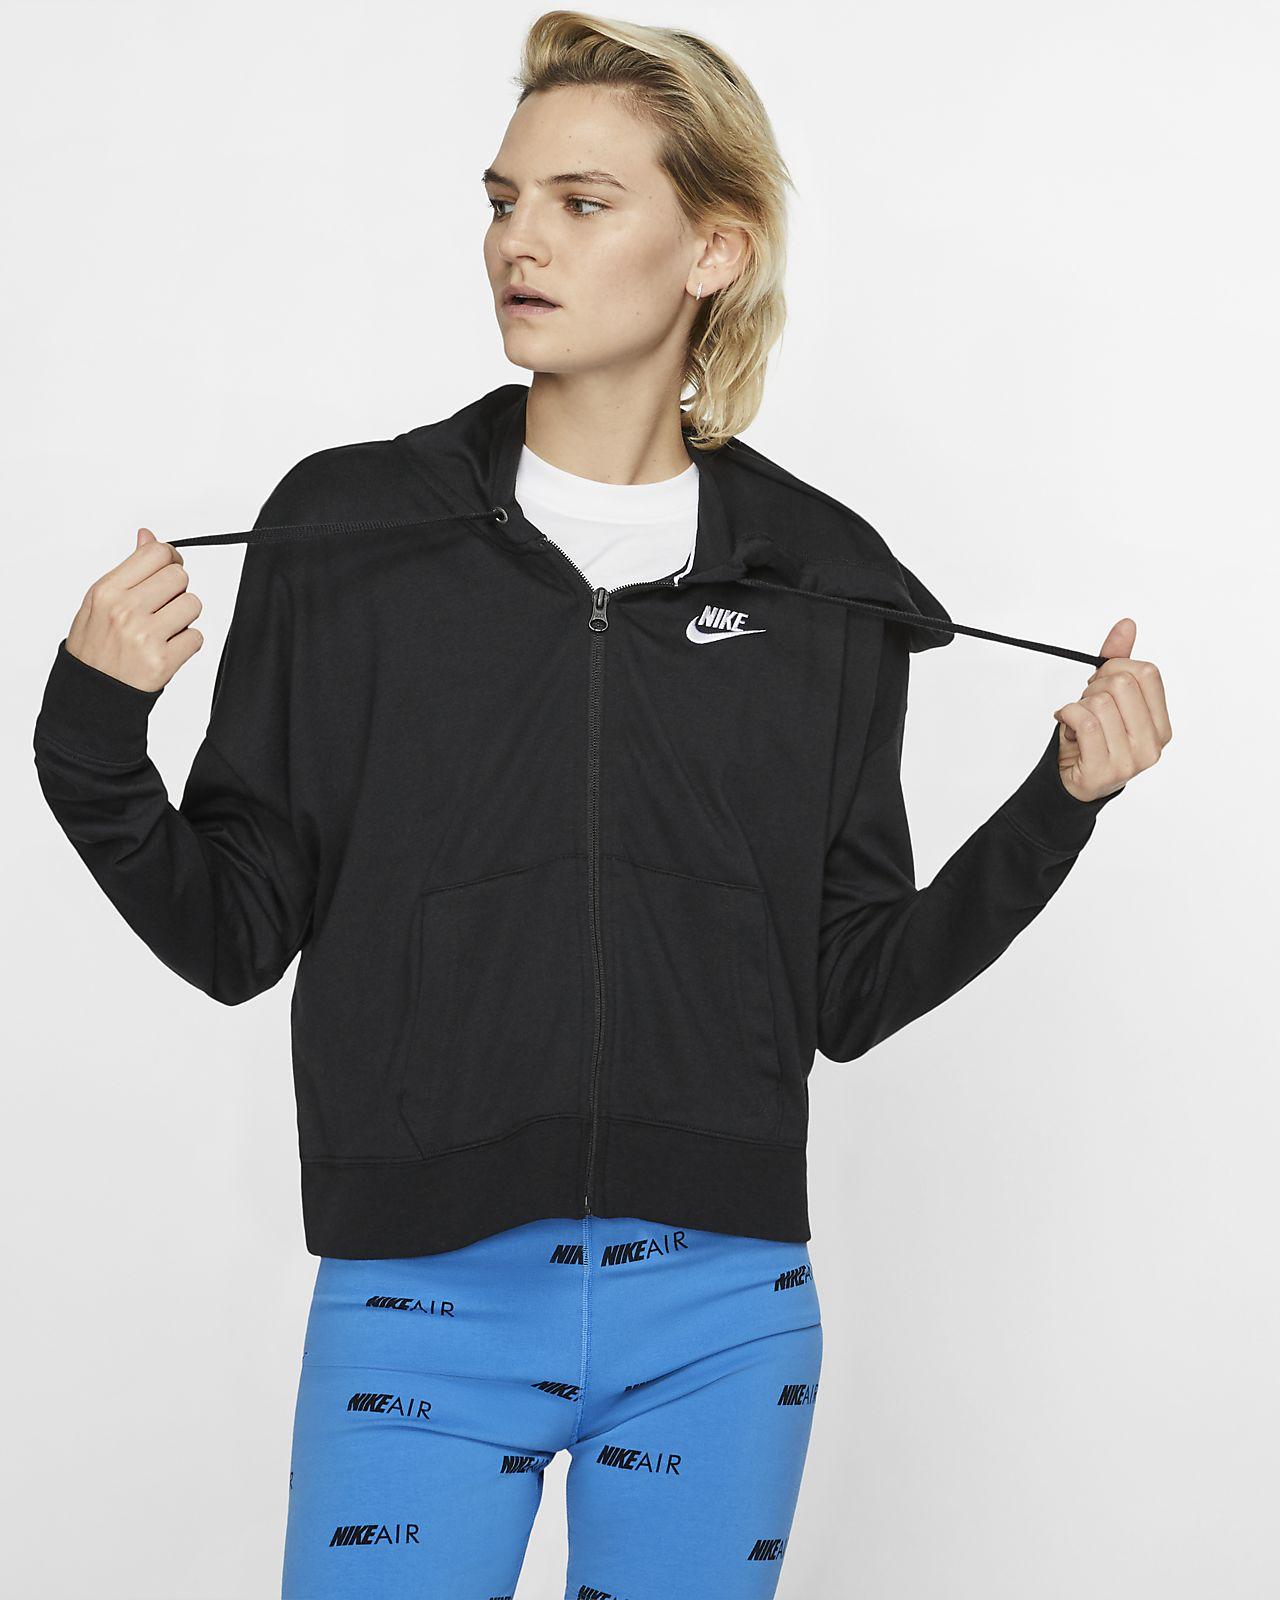 Nike Sportswear 女子全长拉链开襟连帽衫